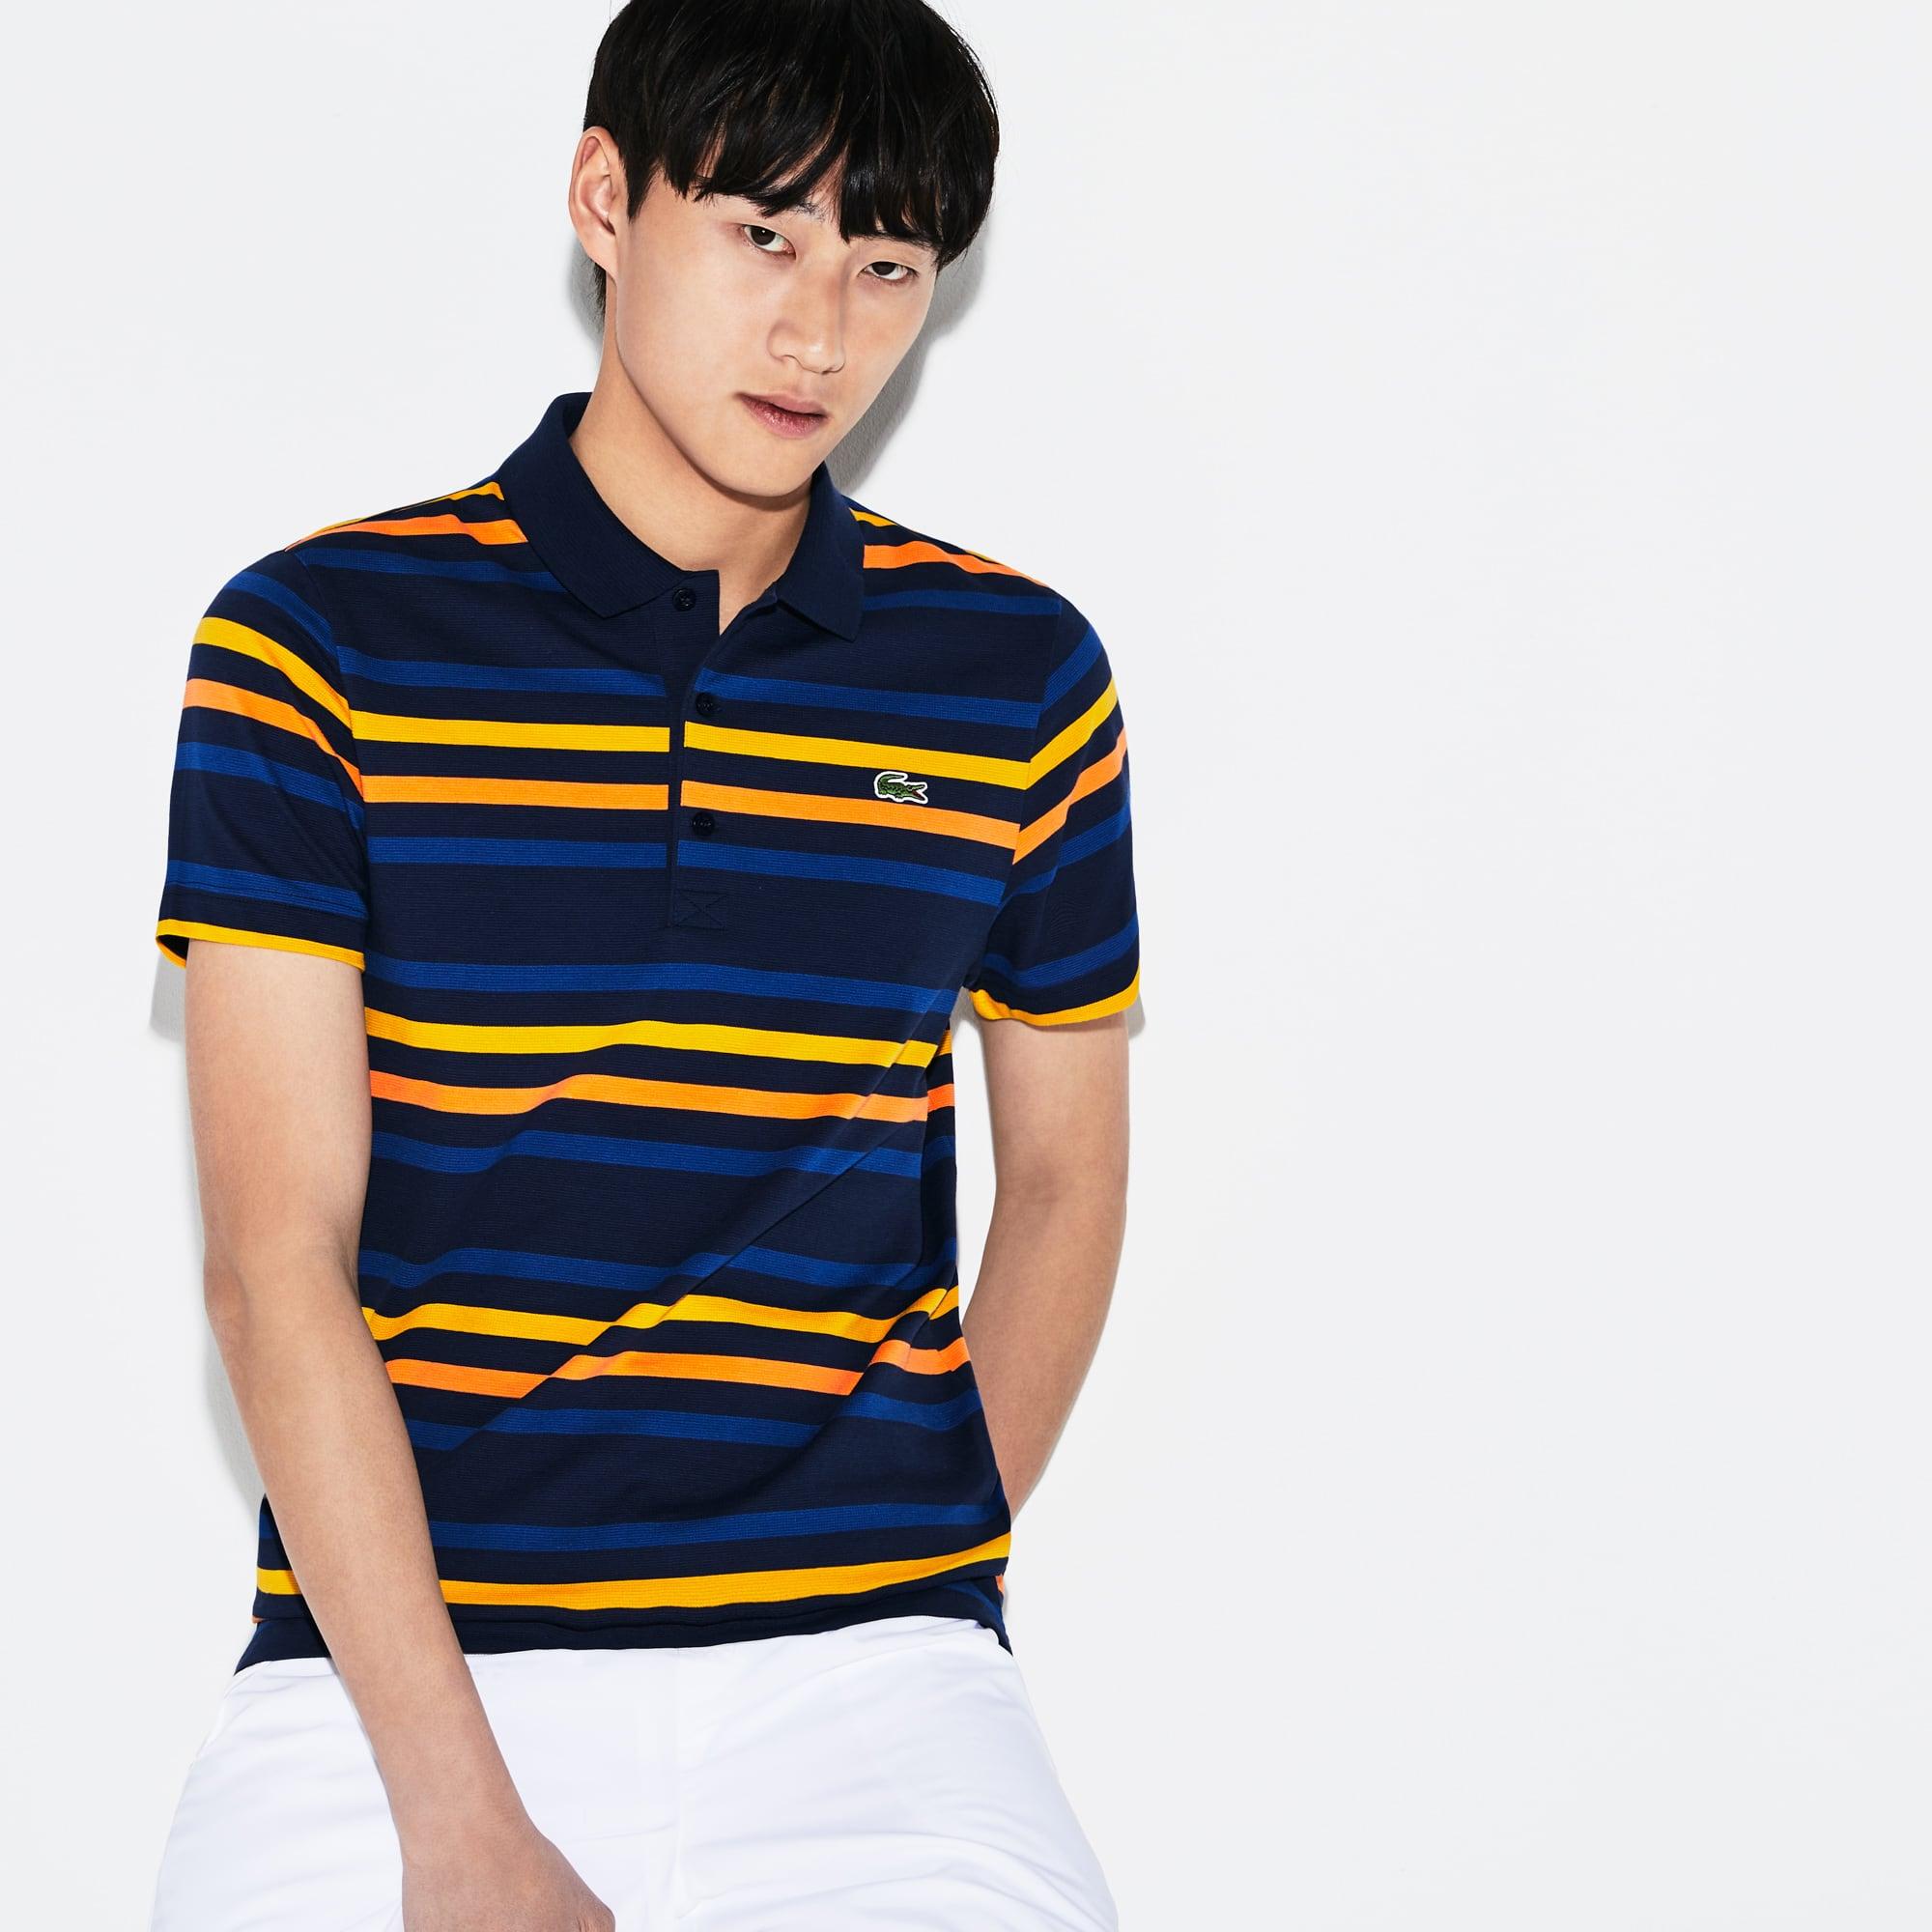 ba5bb40db2 Camisas polo para homens